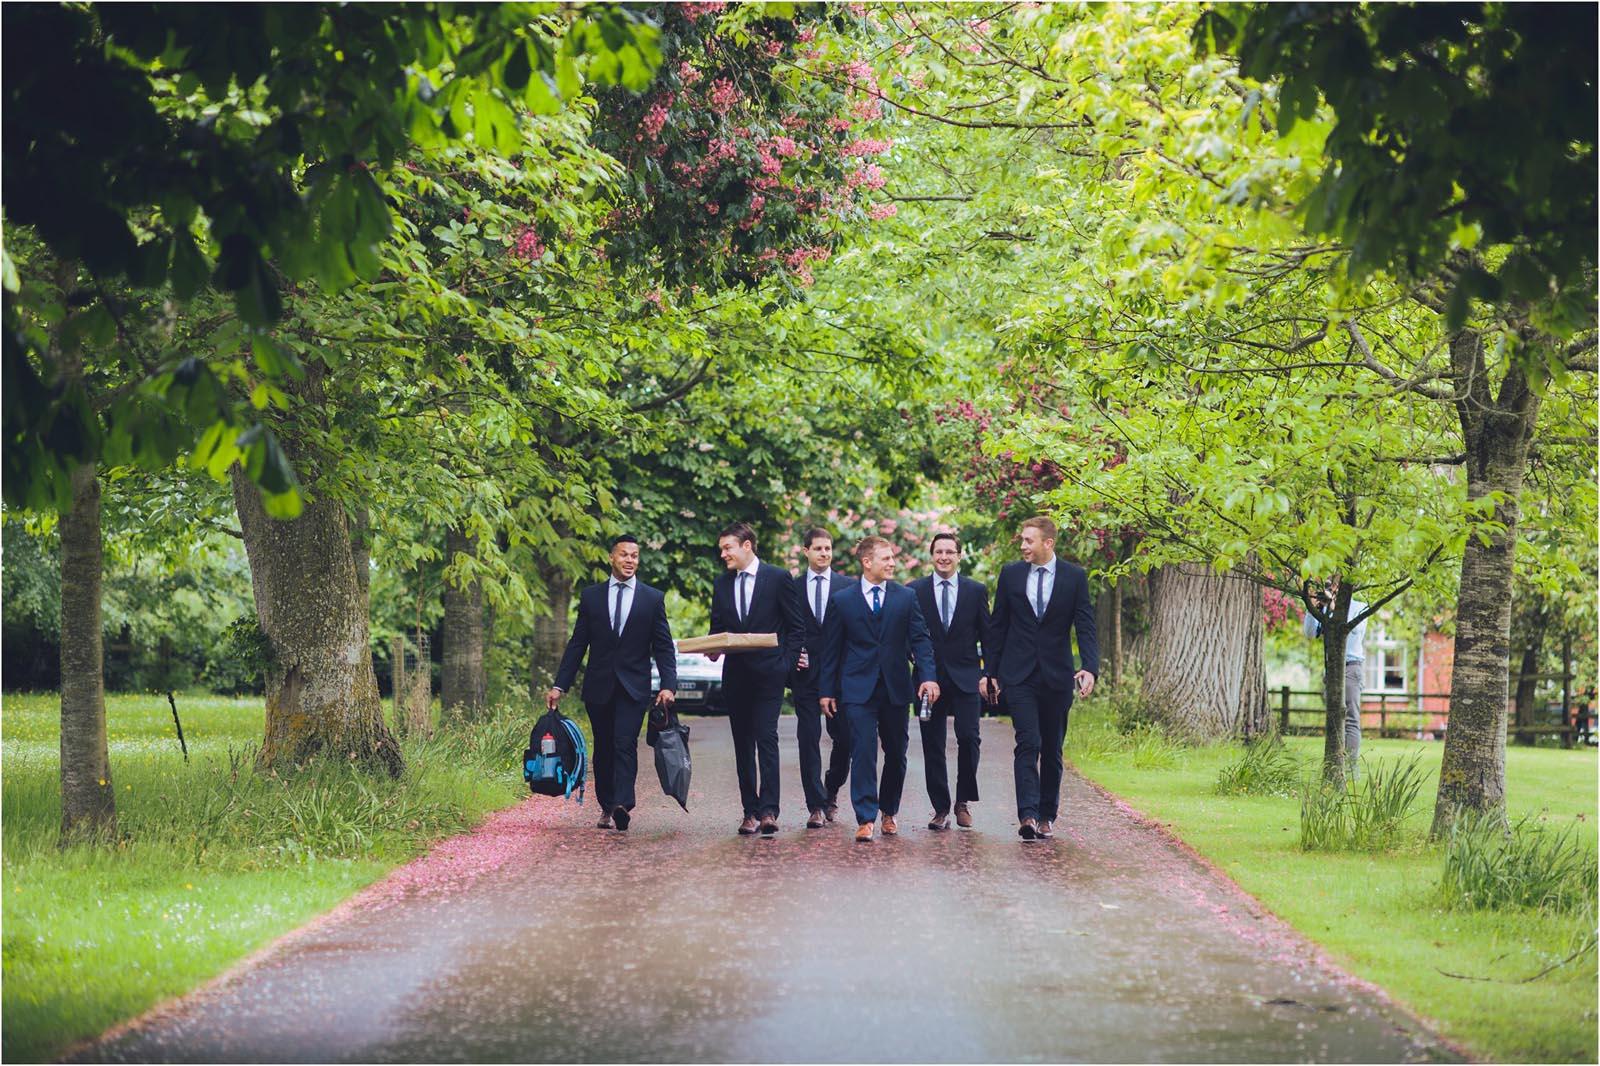 Simon biffen wedding photography 0018